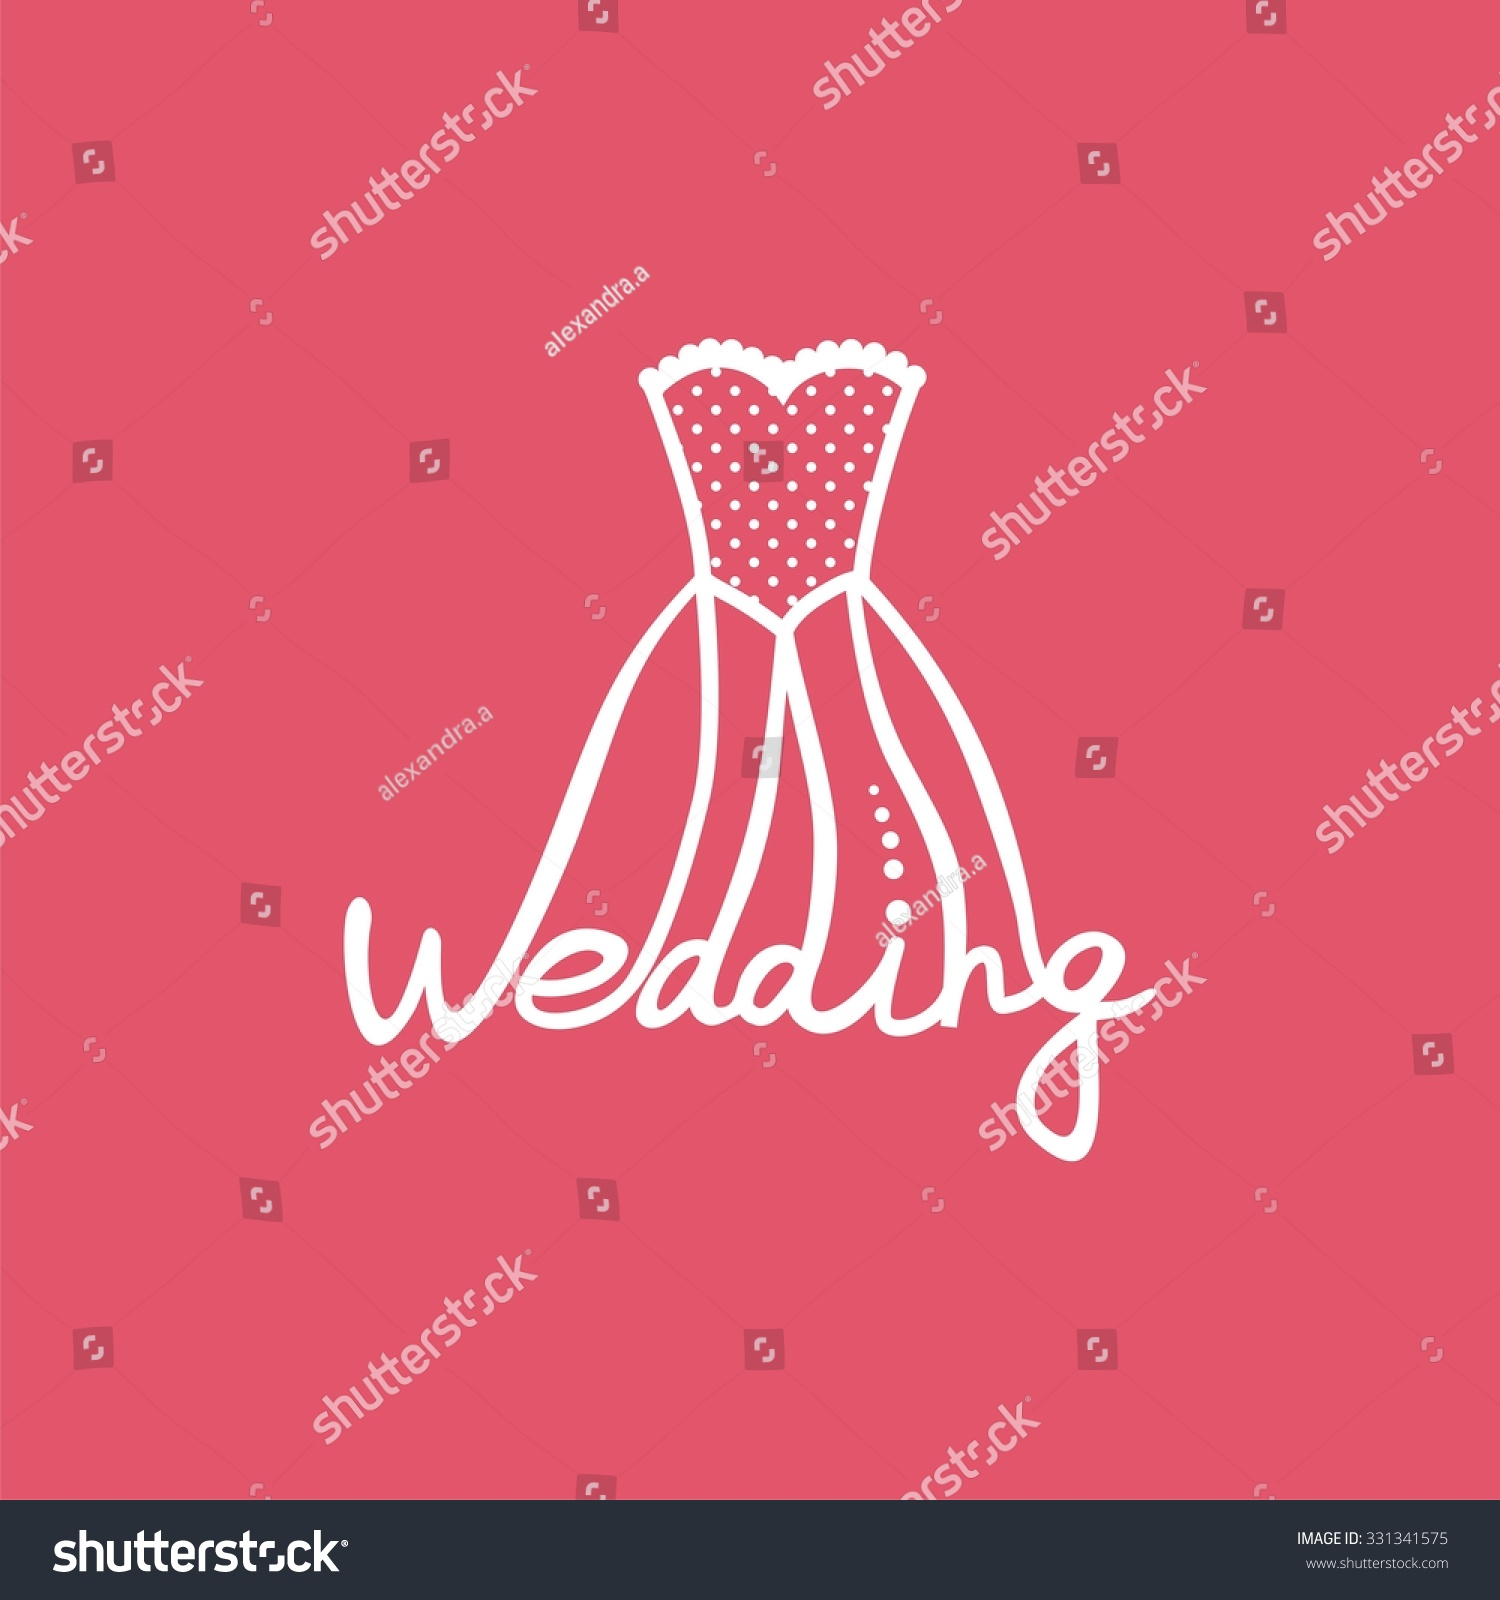 Logo Wedding Dress Image Invitation Card Stock Vector HD (Royalty ...